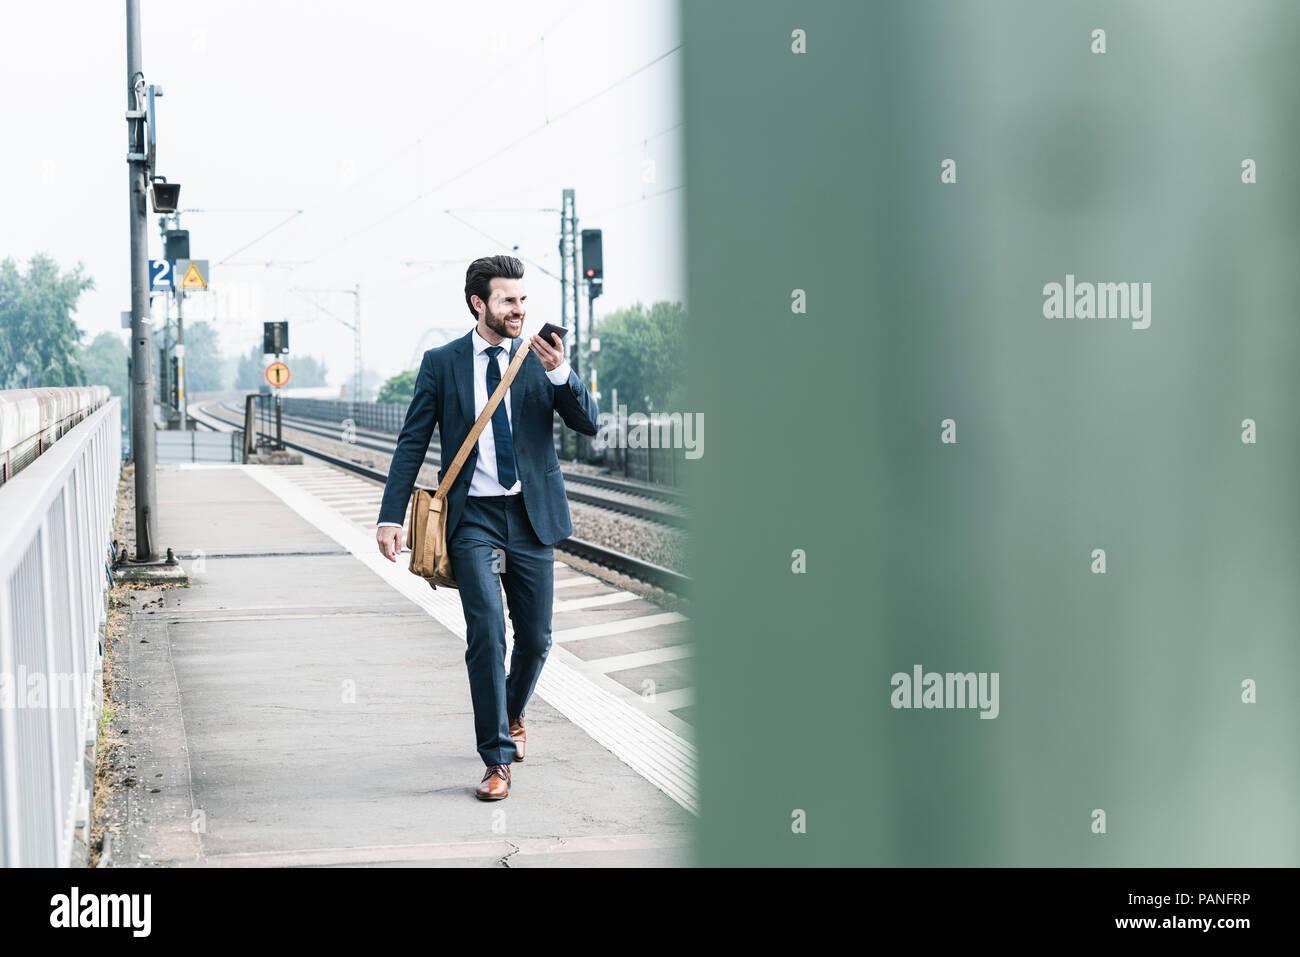 Lächelnd Geschäftsmann mit Mobiltelefon wandern an der Plattform Stockbild